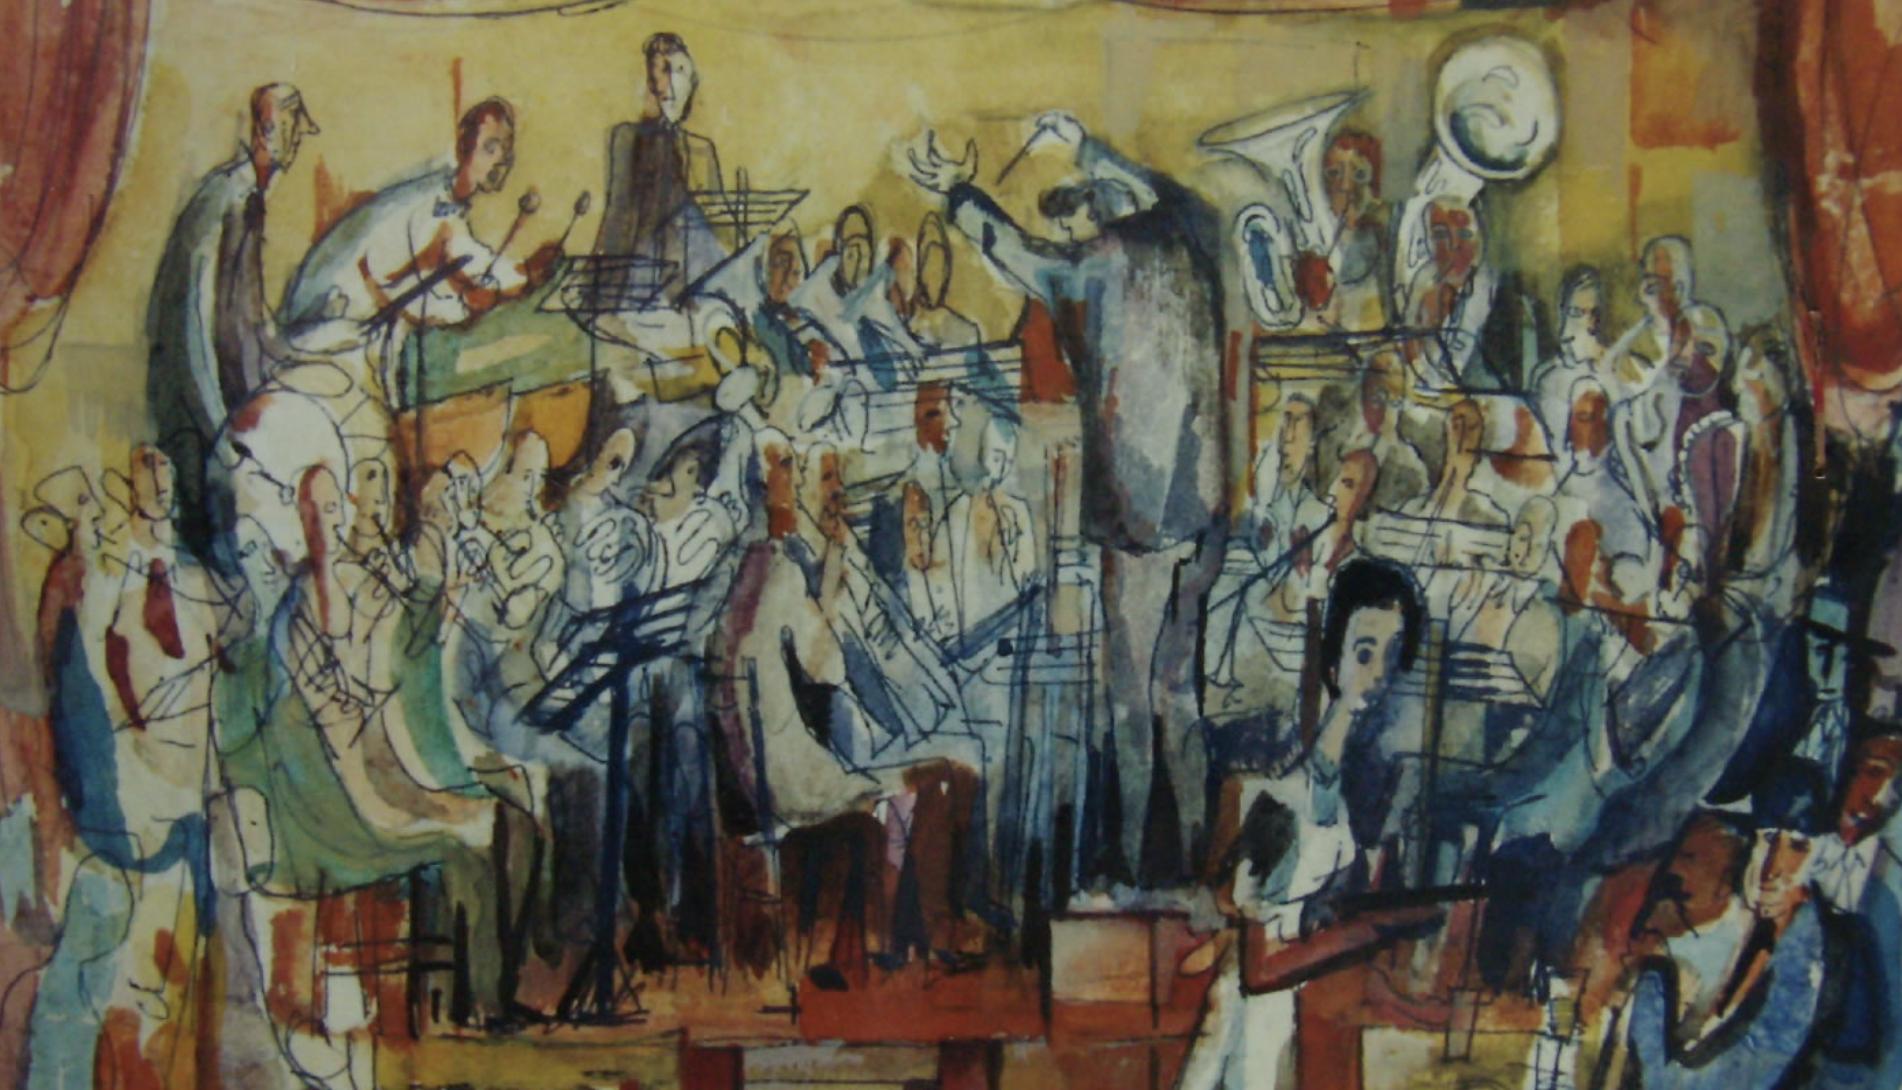 Twee illustere harmonie orkesten